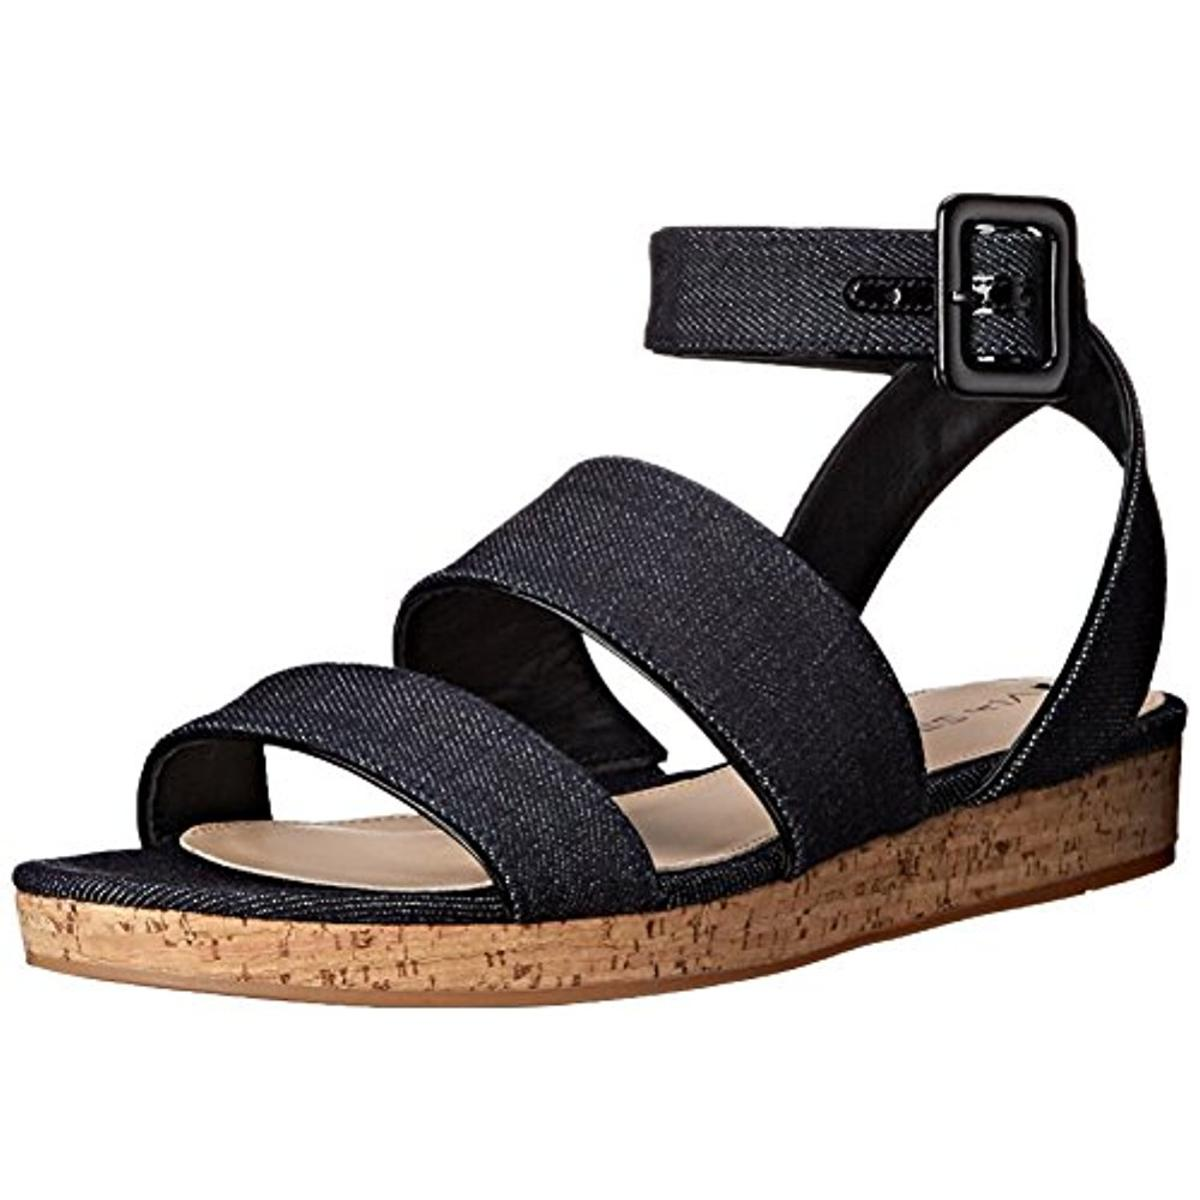 Via Spiga Womens Dianne Canvas Ankle strap Gladiator Sandals